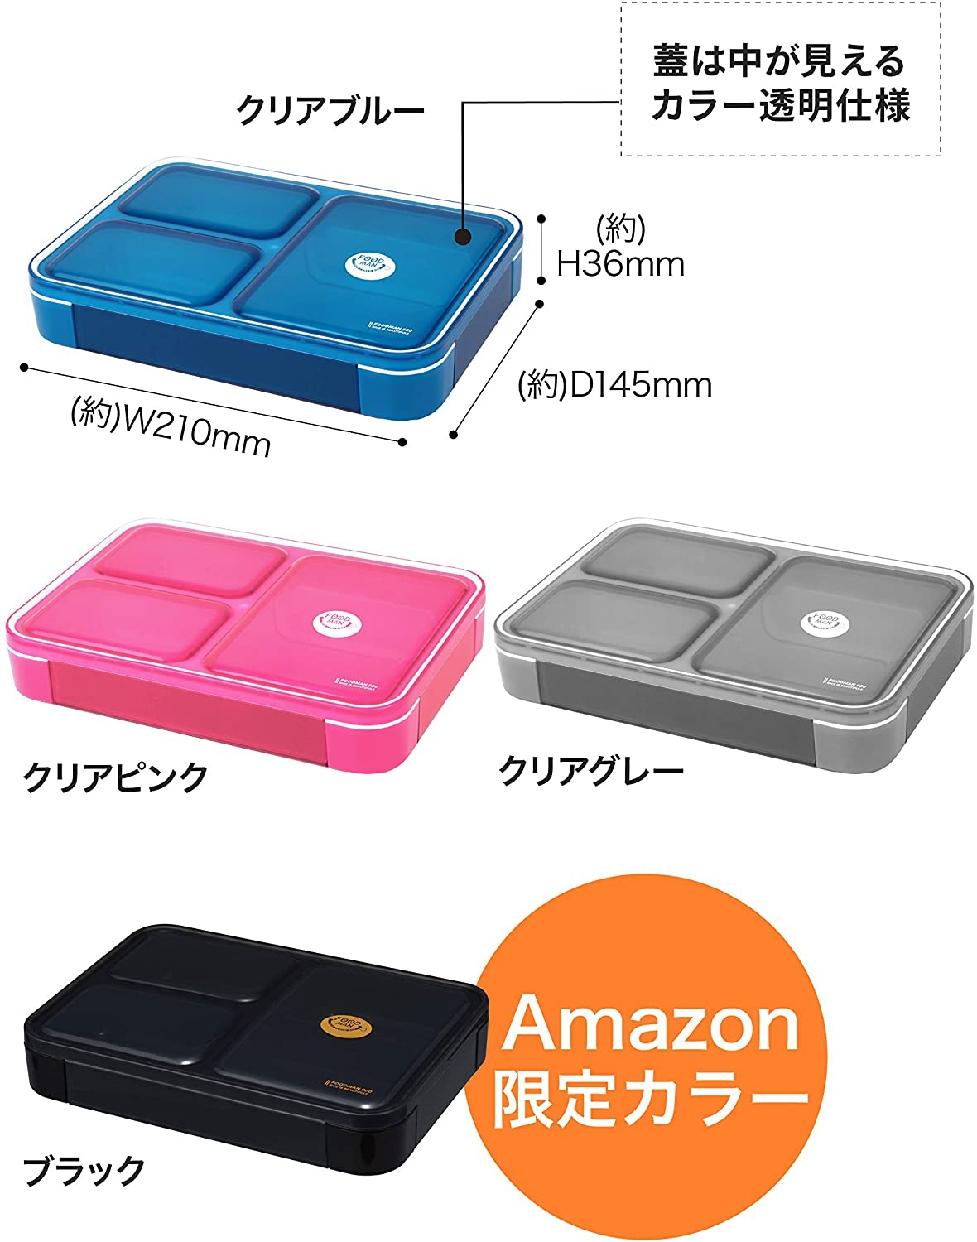 CB JAPAN(シービージャパン) 薄型弁当箱フードマン600の商品画像7